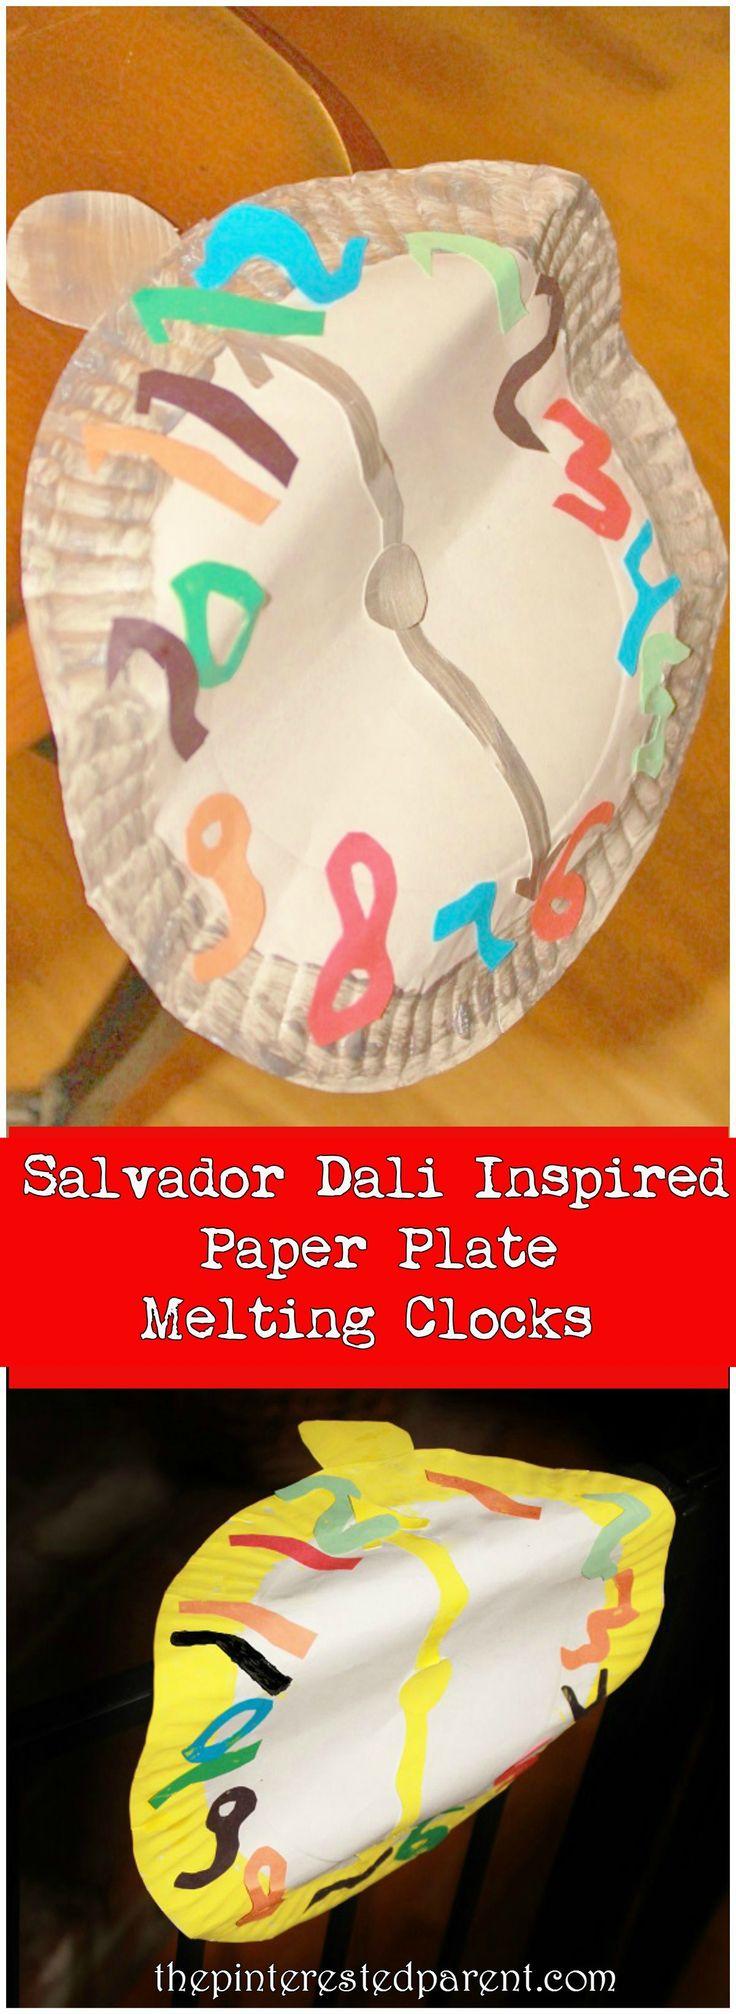 Salvador Dali Inspired Paper Plate Melting Clocks